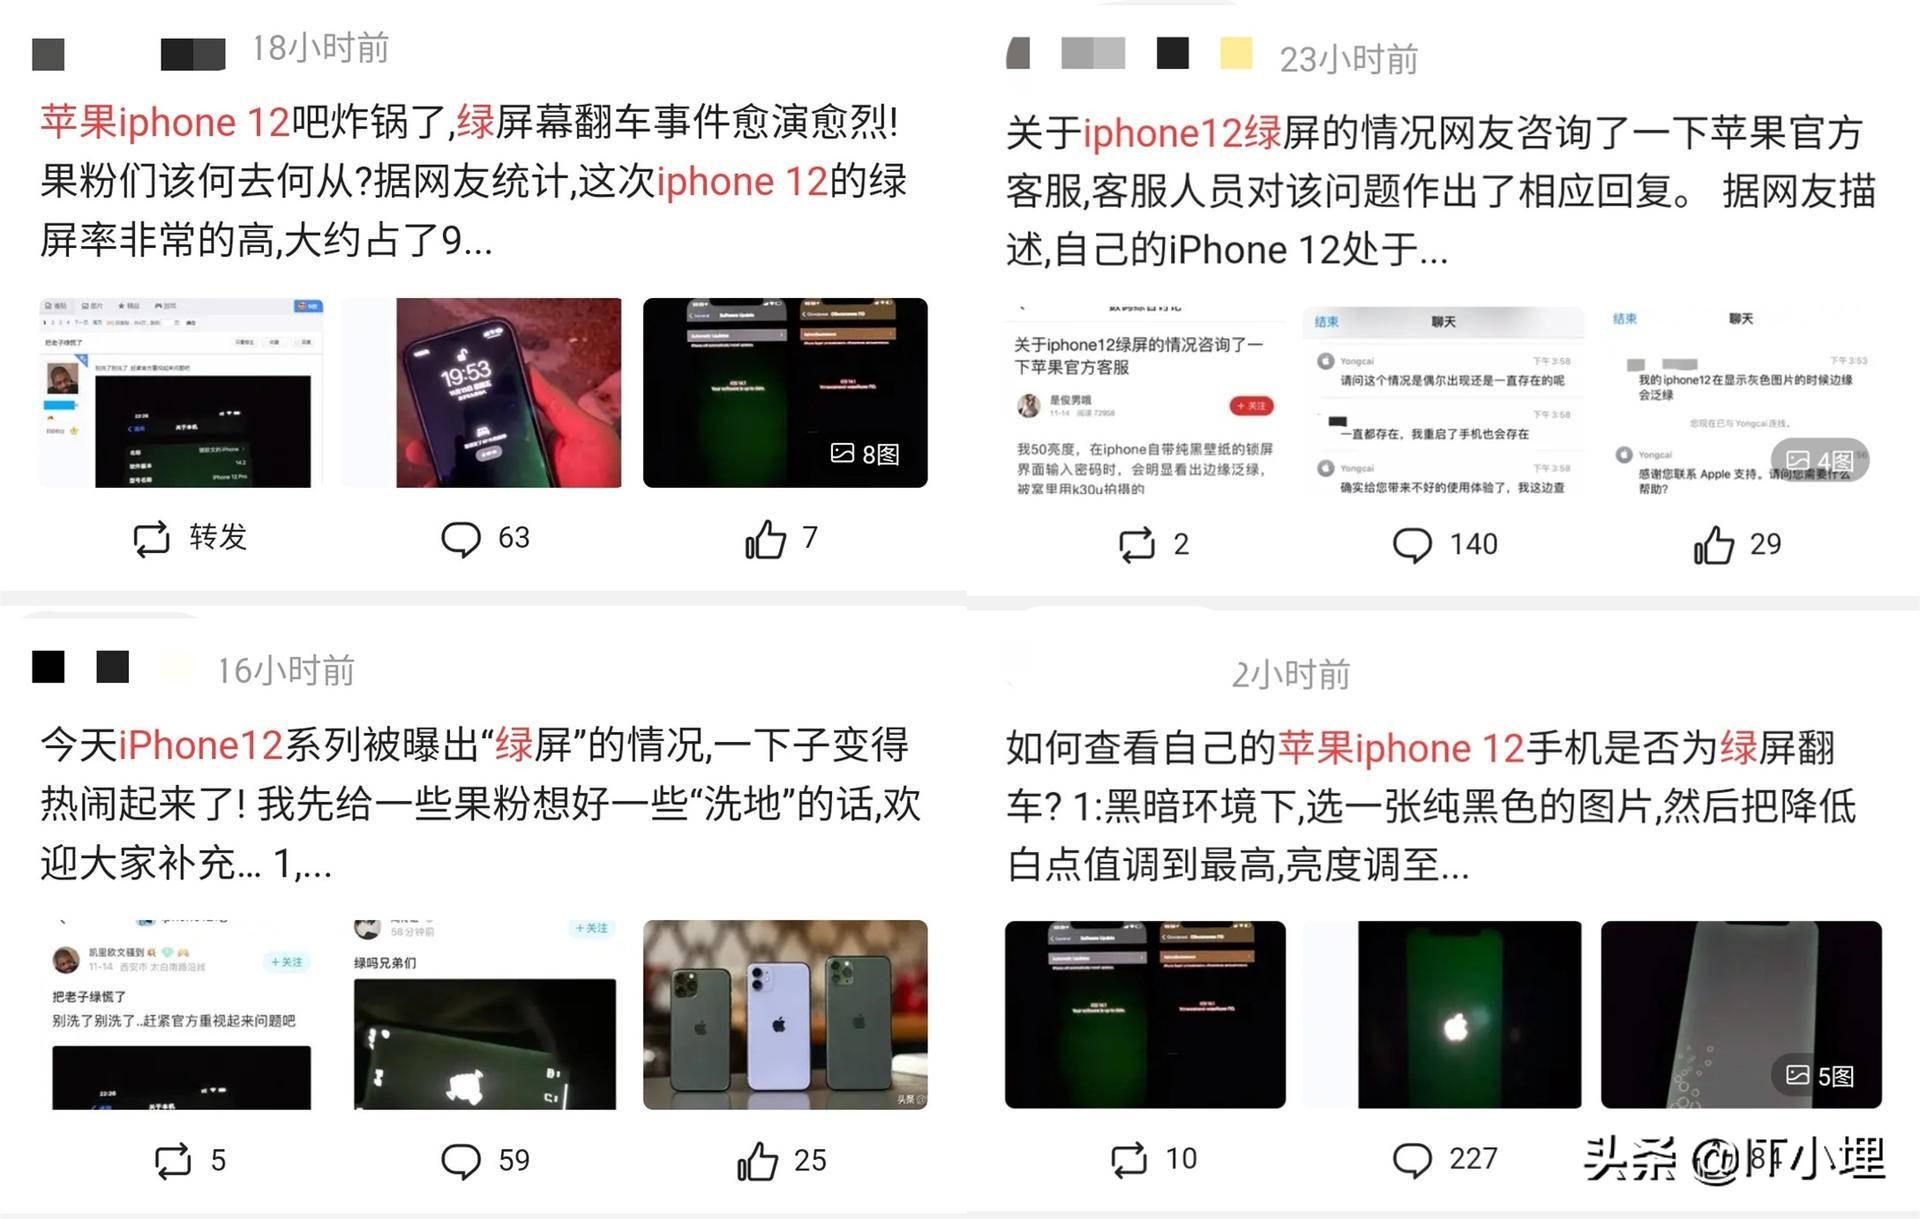 iPhone12绿屏门和断触问题,掉漆、信号差、阴阳屏什么原因引起的?